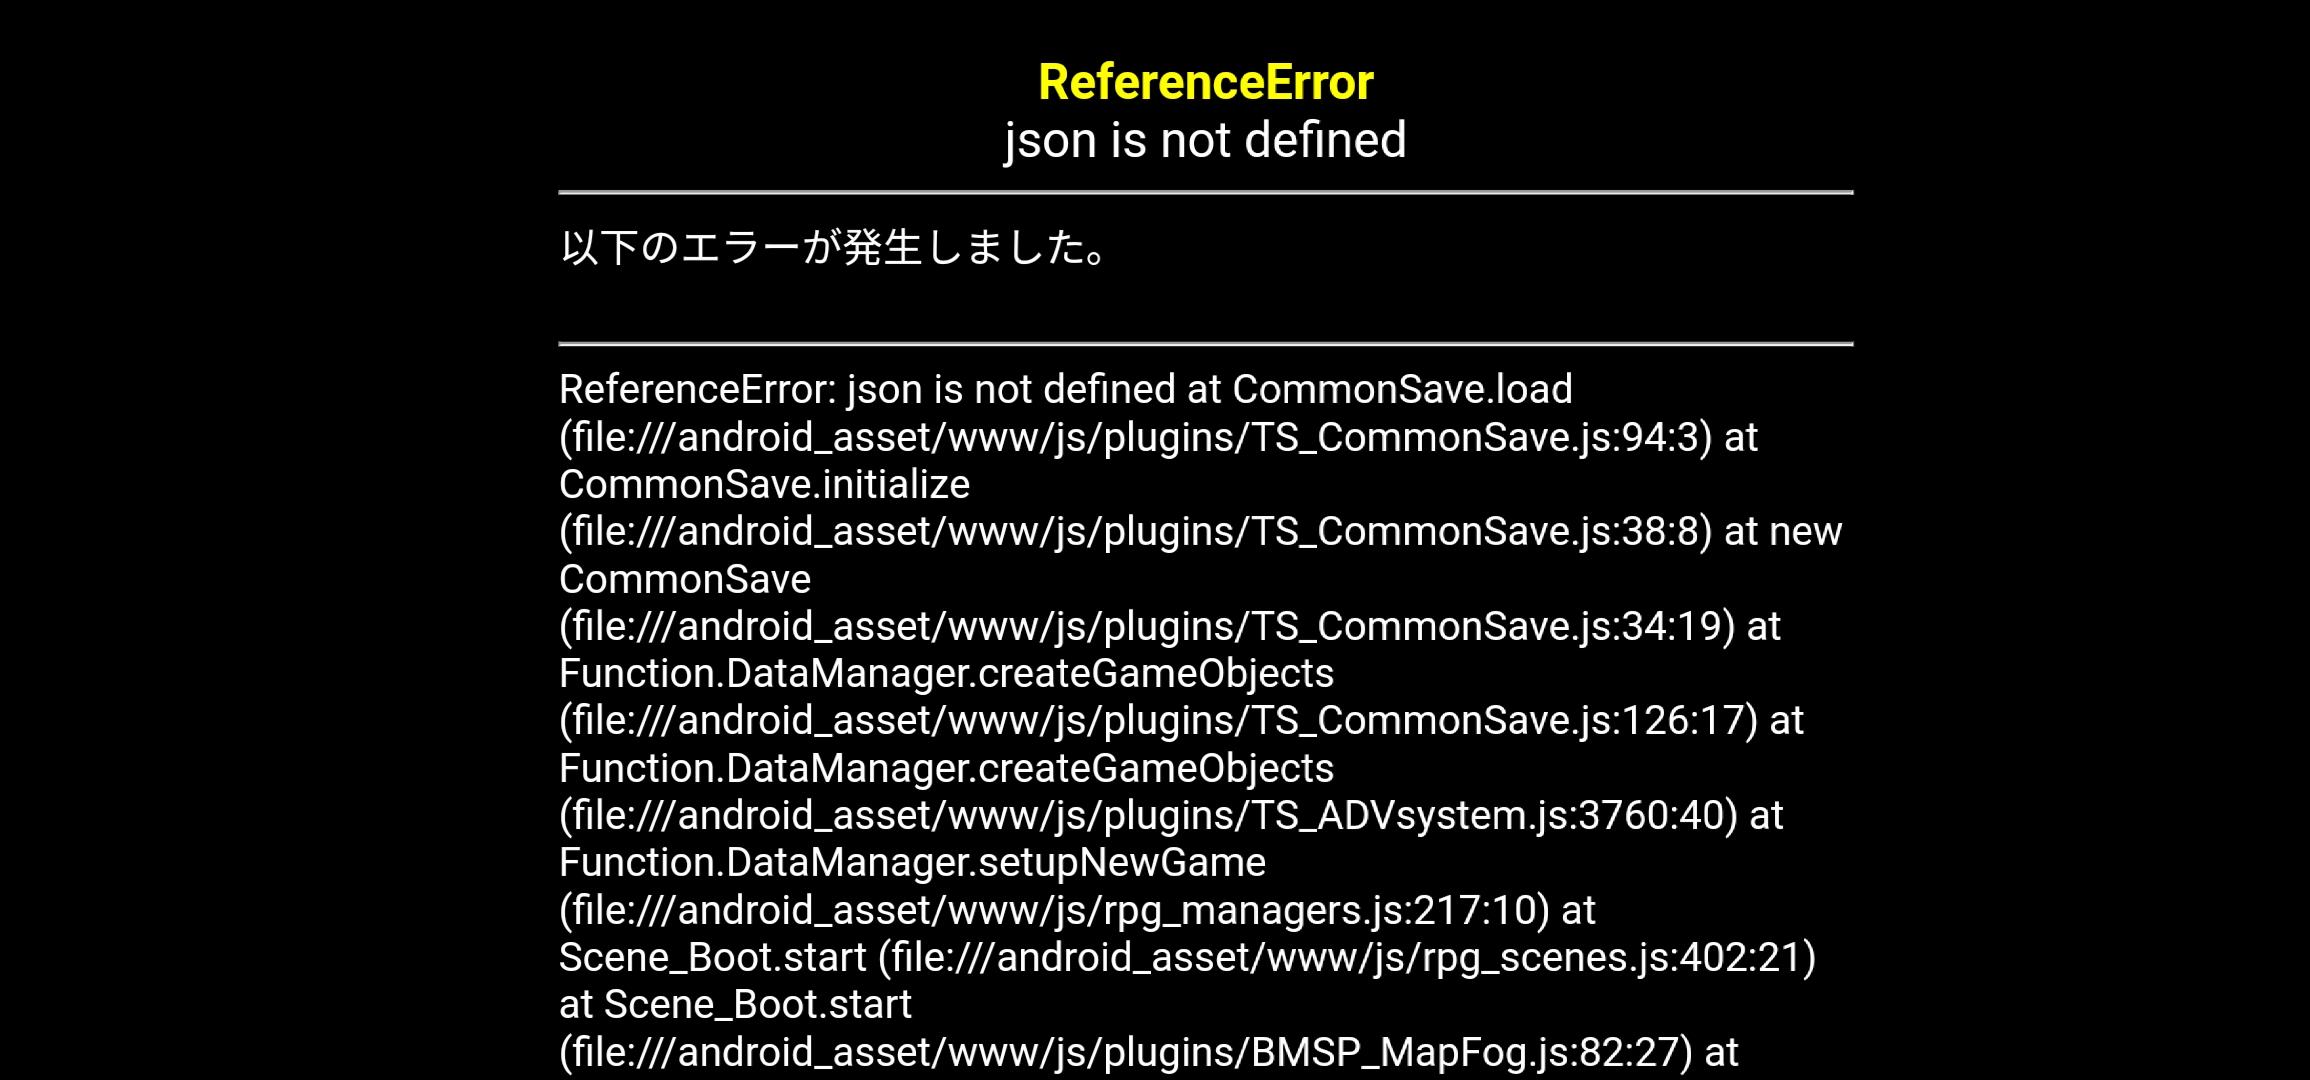 Screenshot_20210709_063622_mingtang.lx.mengmozhijieheerneilika.jpg